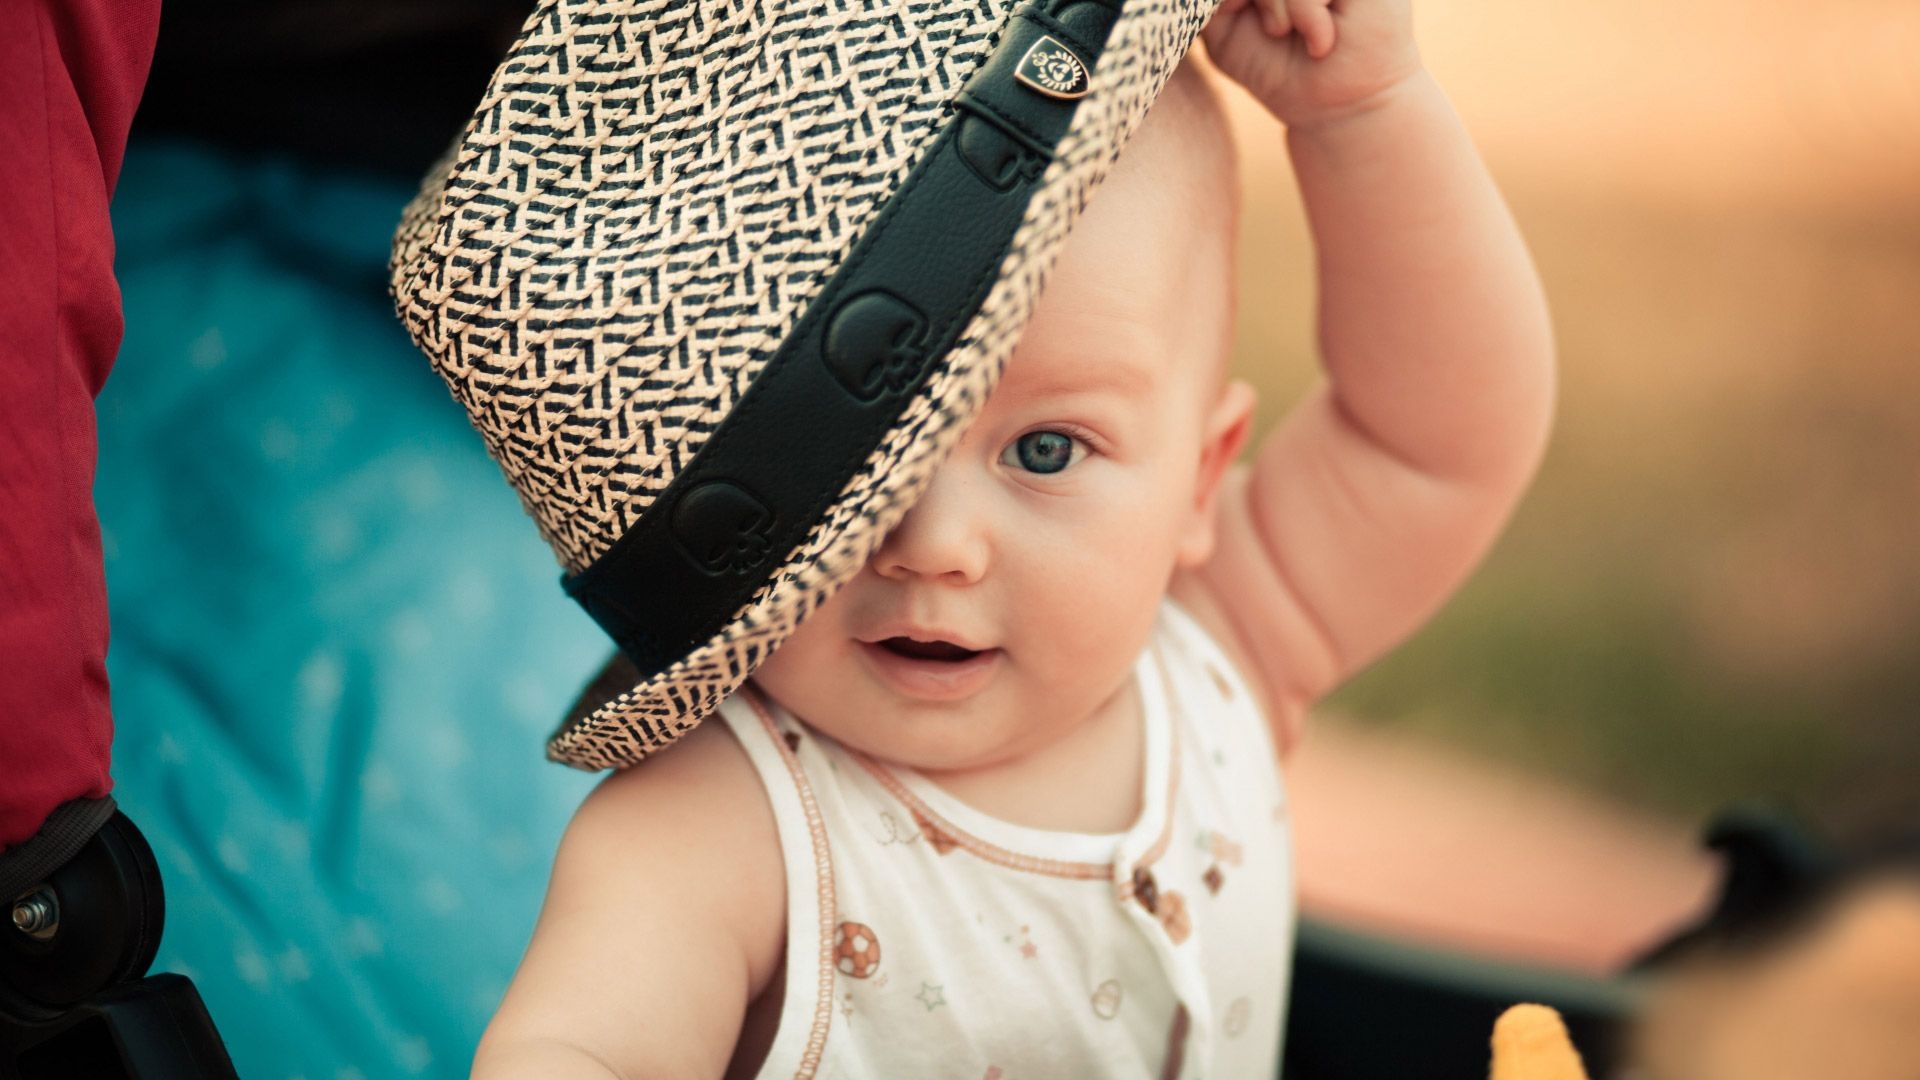 Cute Baby Girl Boy Hd Free Wallpapers: Cute Baby Boy HD Wallpaper Cute And Sweet Babies HD